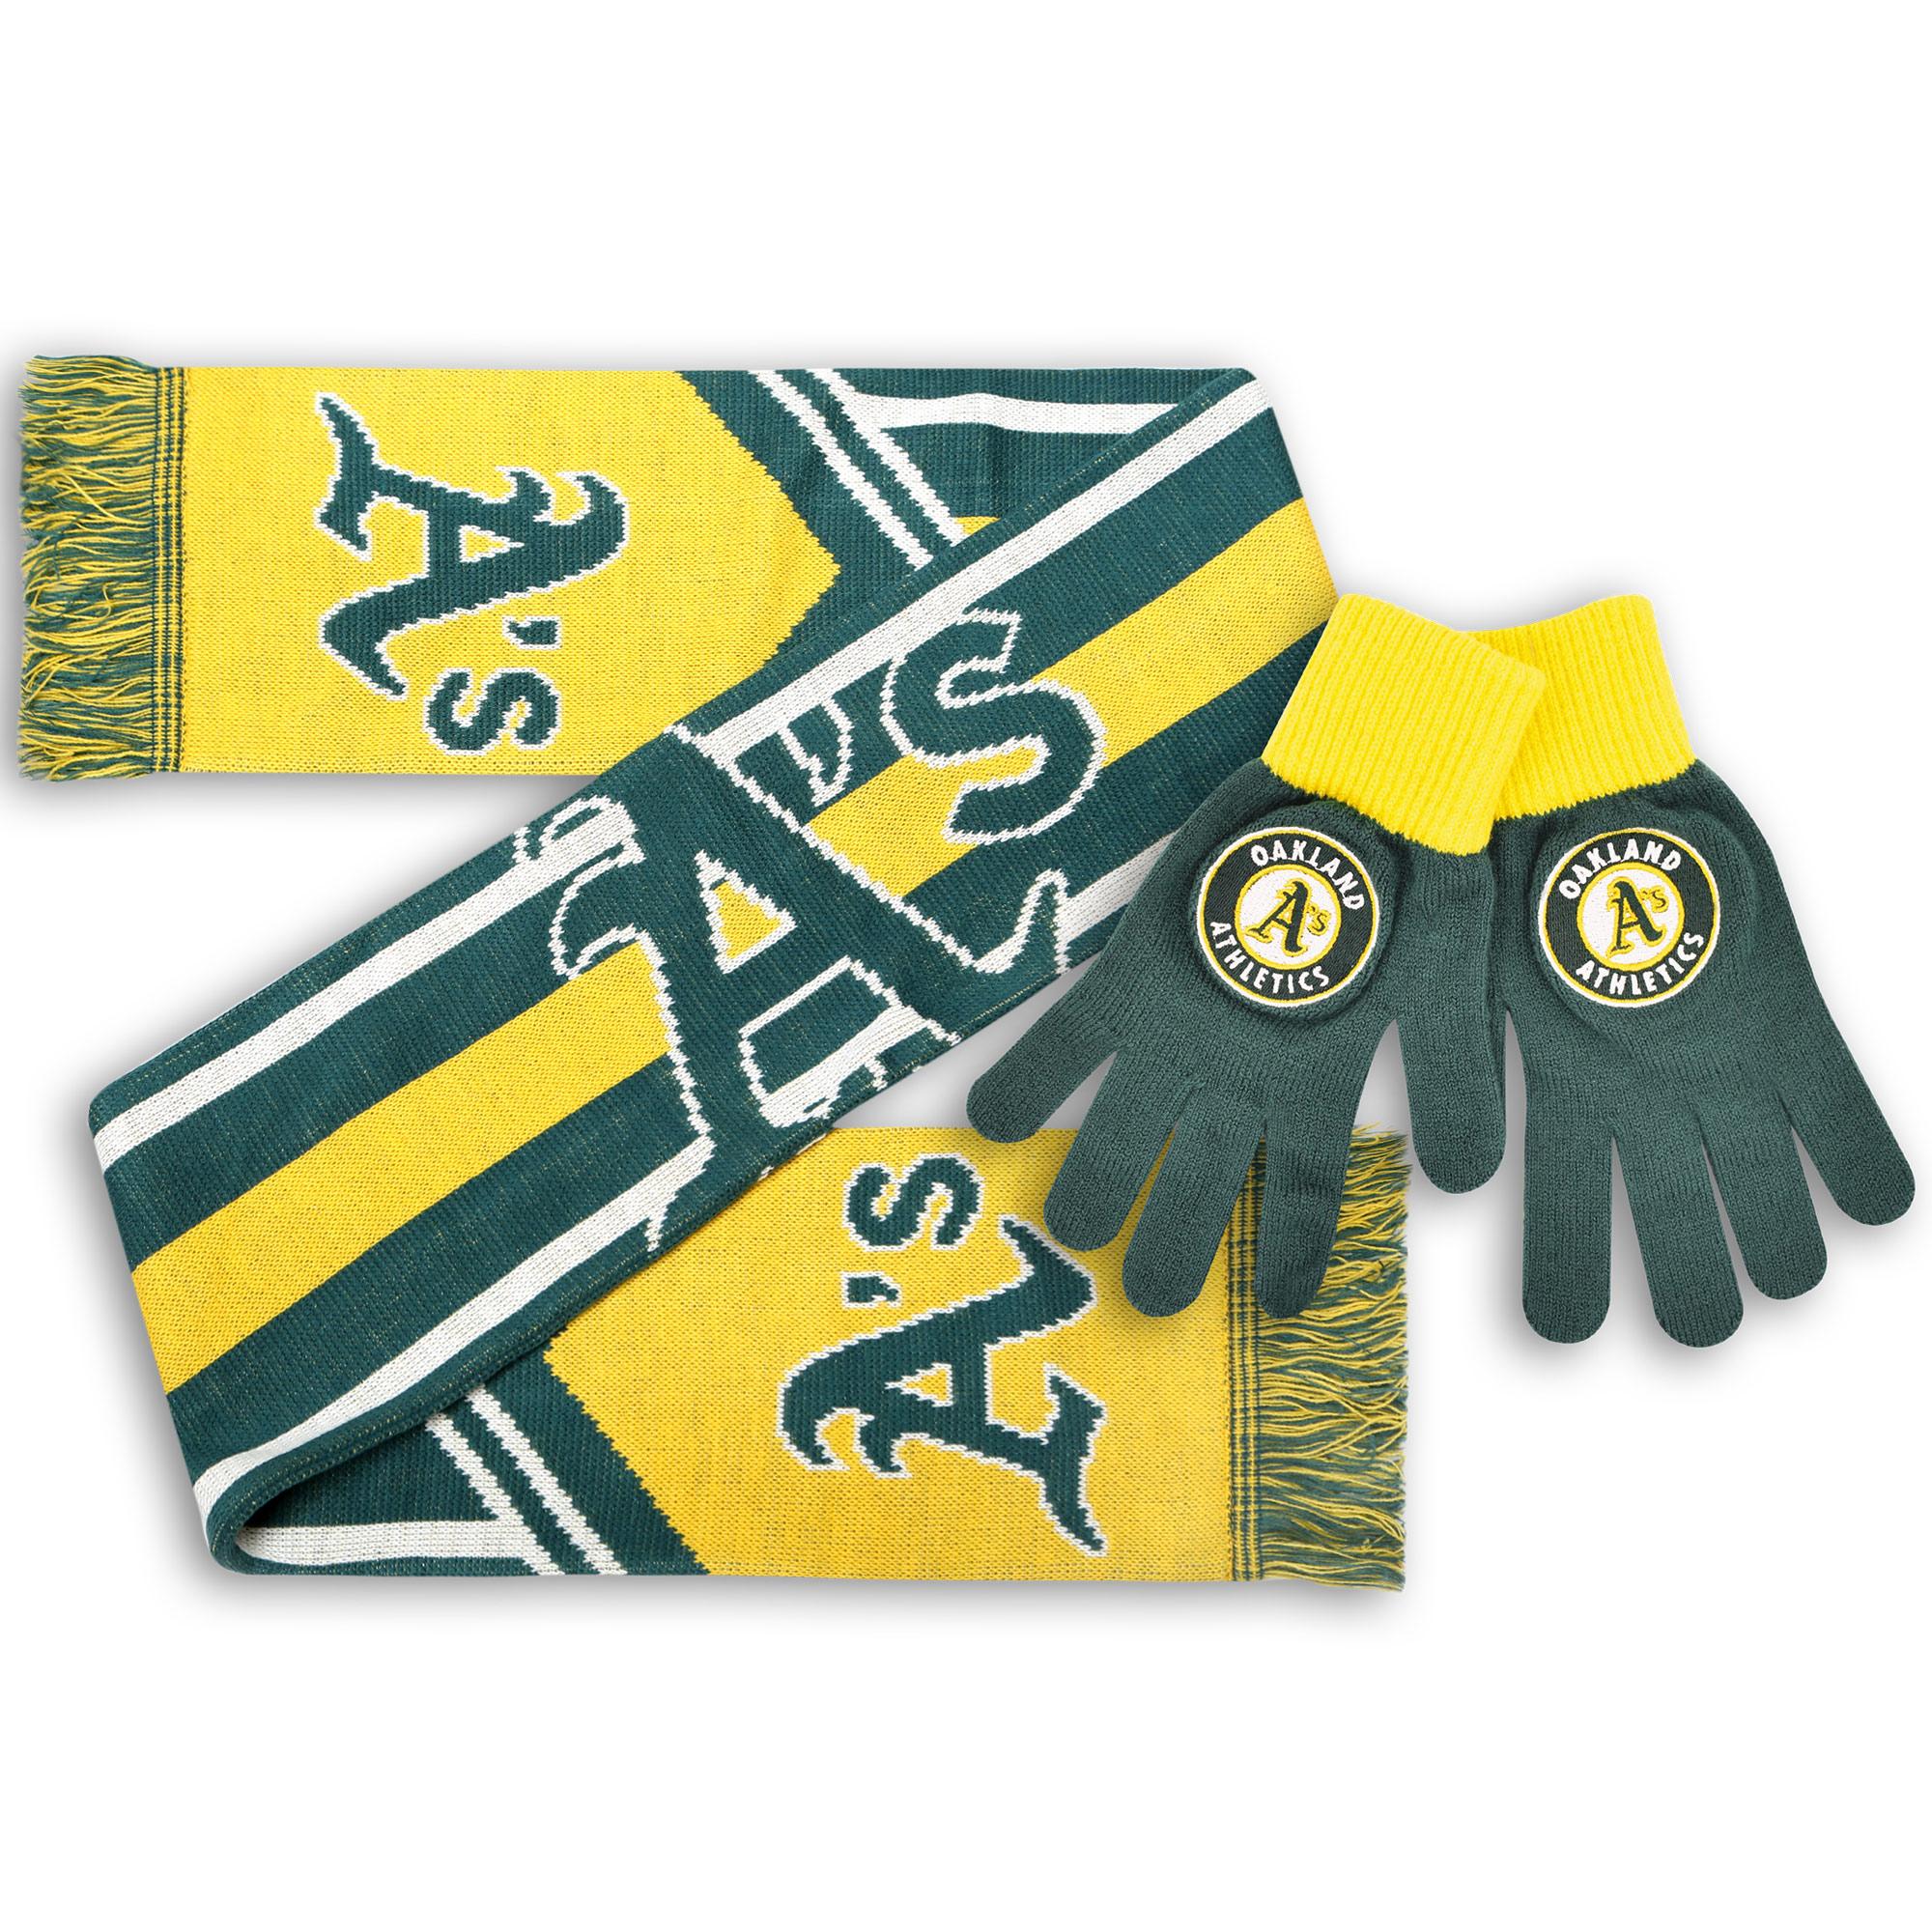 Oakland Athletics Knit Gloves and Scarf Set - No Size